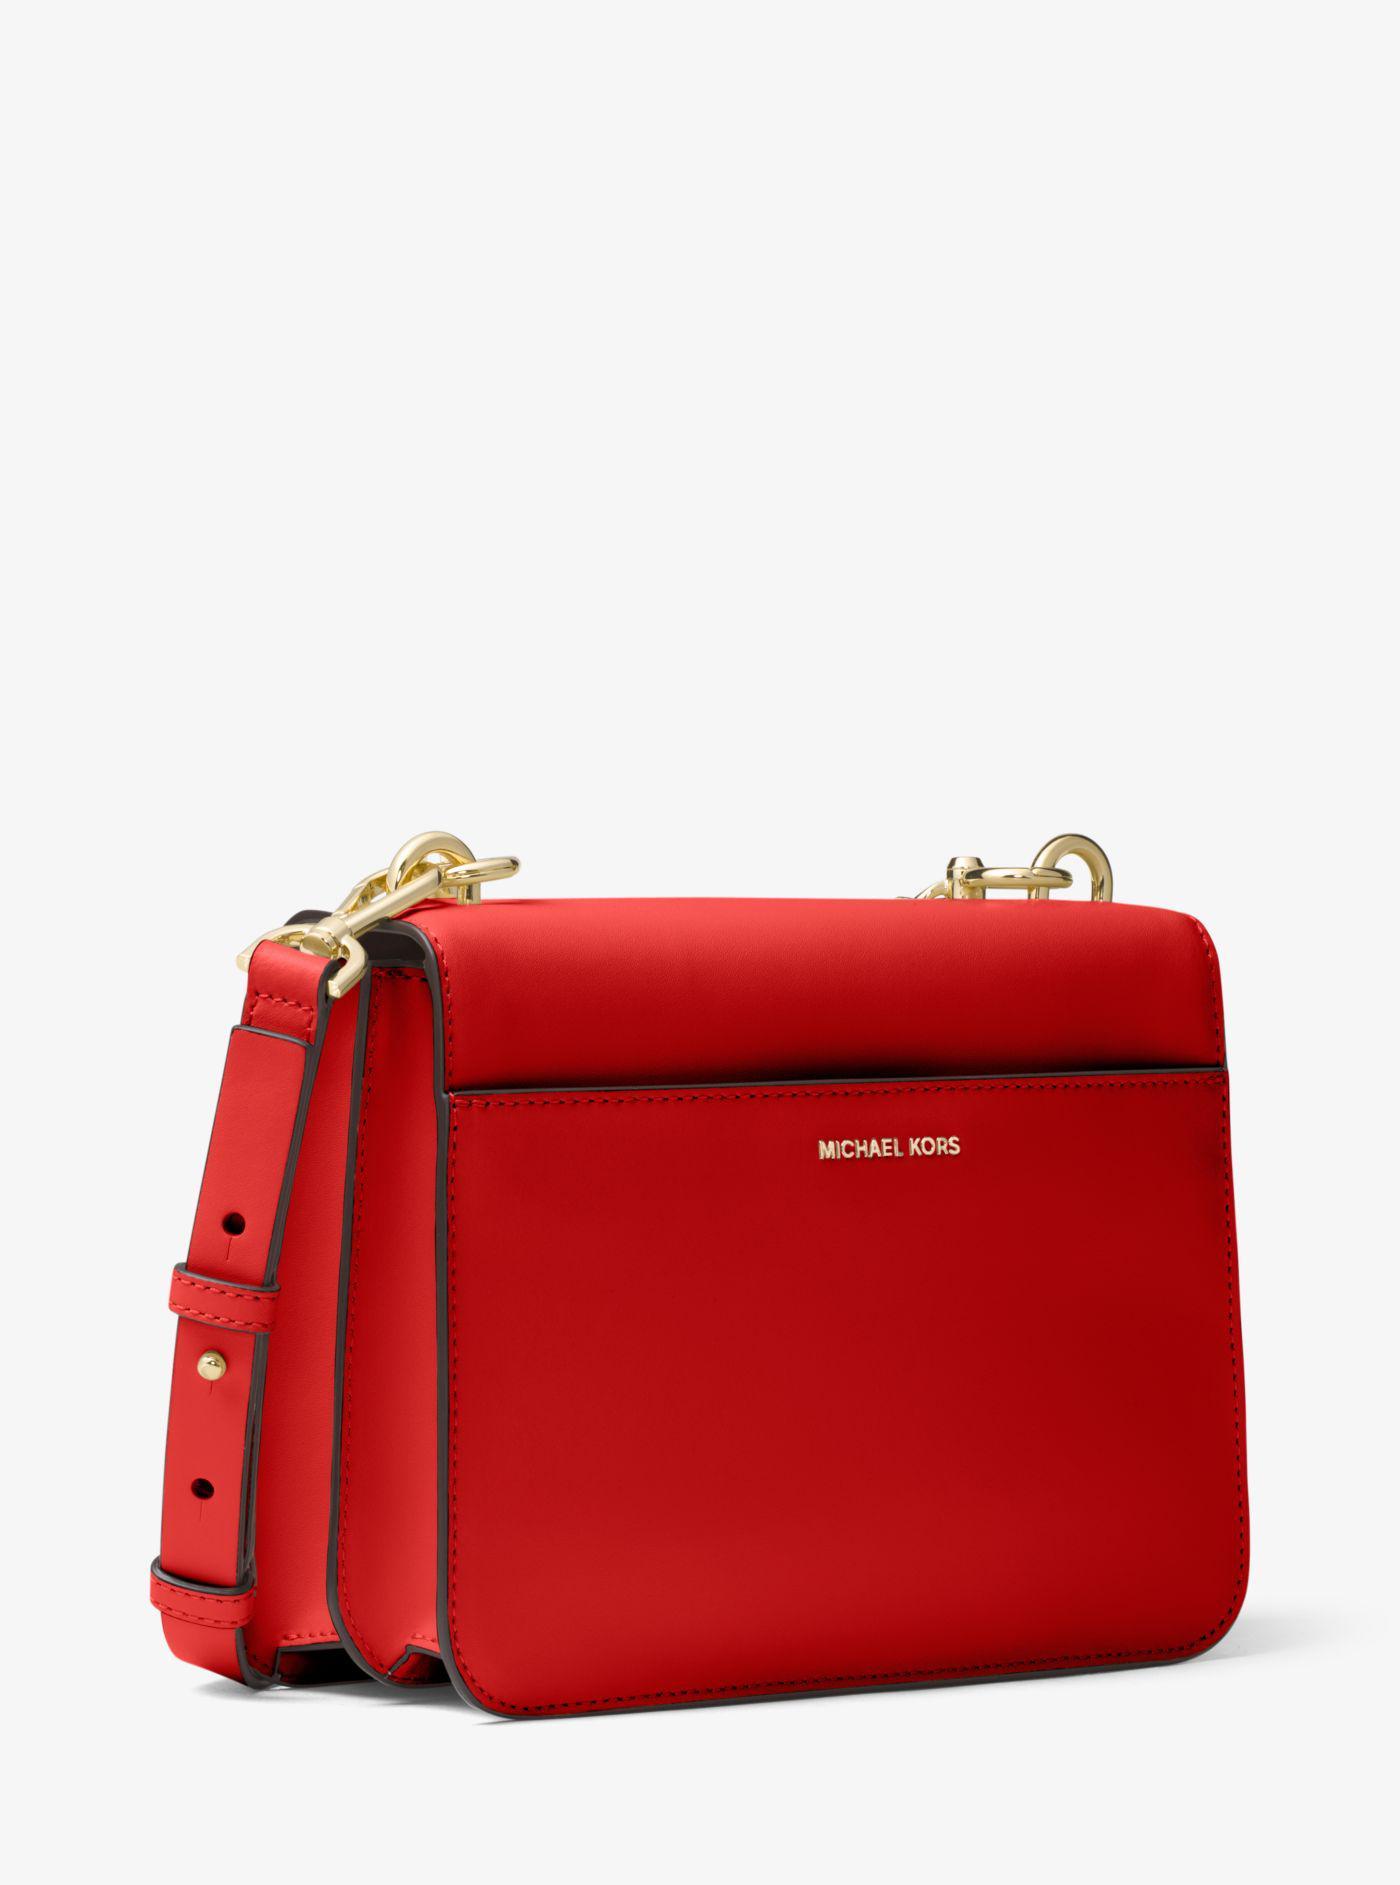 4c094dddcfbd Lyst - Michael Kors Mott Leather Crossbody in Red